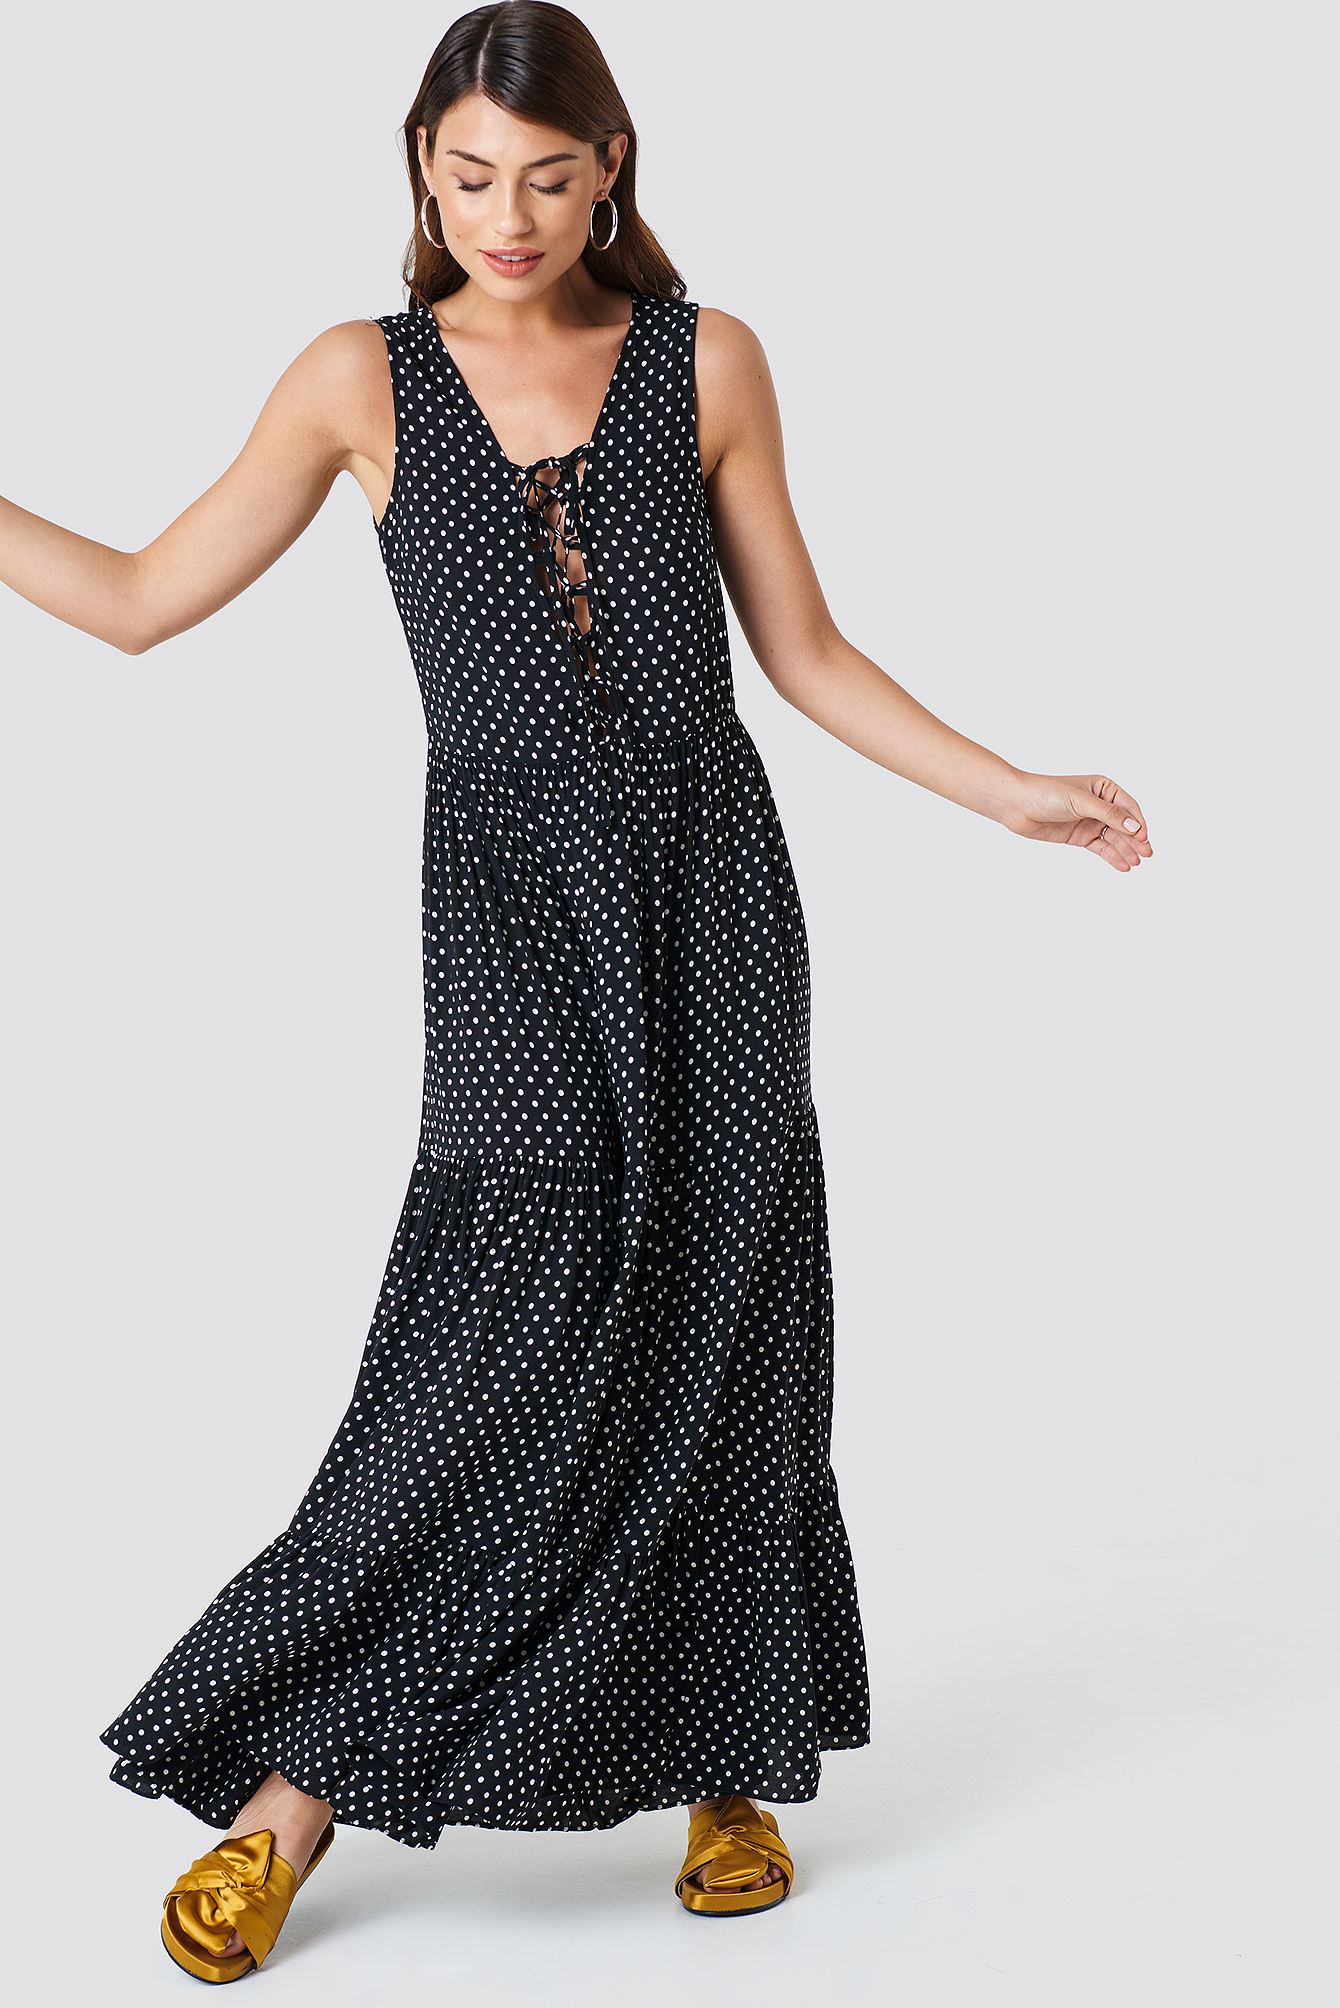 Dotted Maxi Dress NA-KD.COM